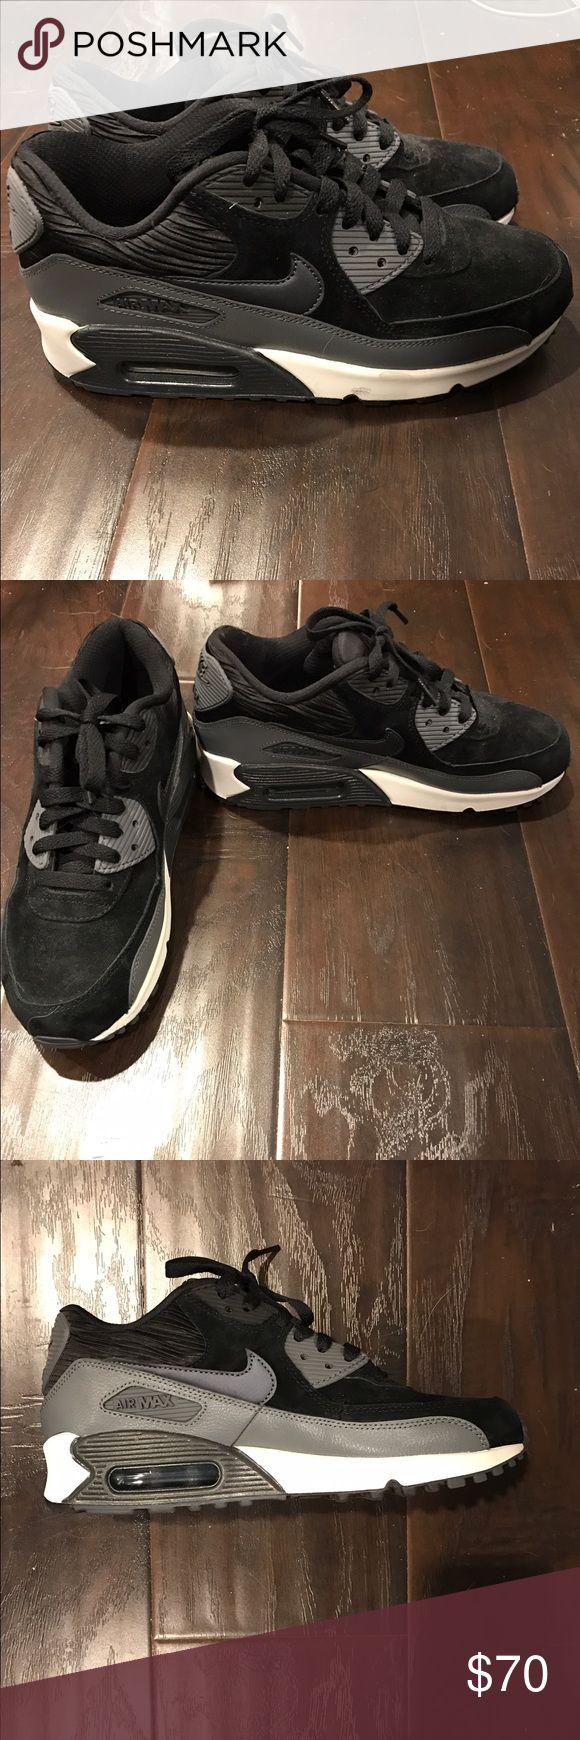 Nike Air Max 90 Black and gray Nike Air Max 90 Nike Shoes Athletic Shoes